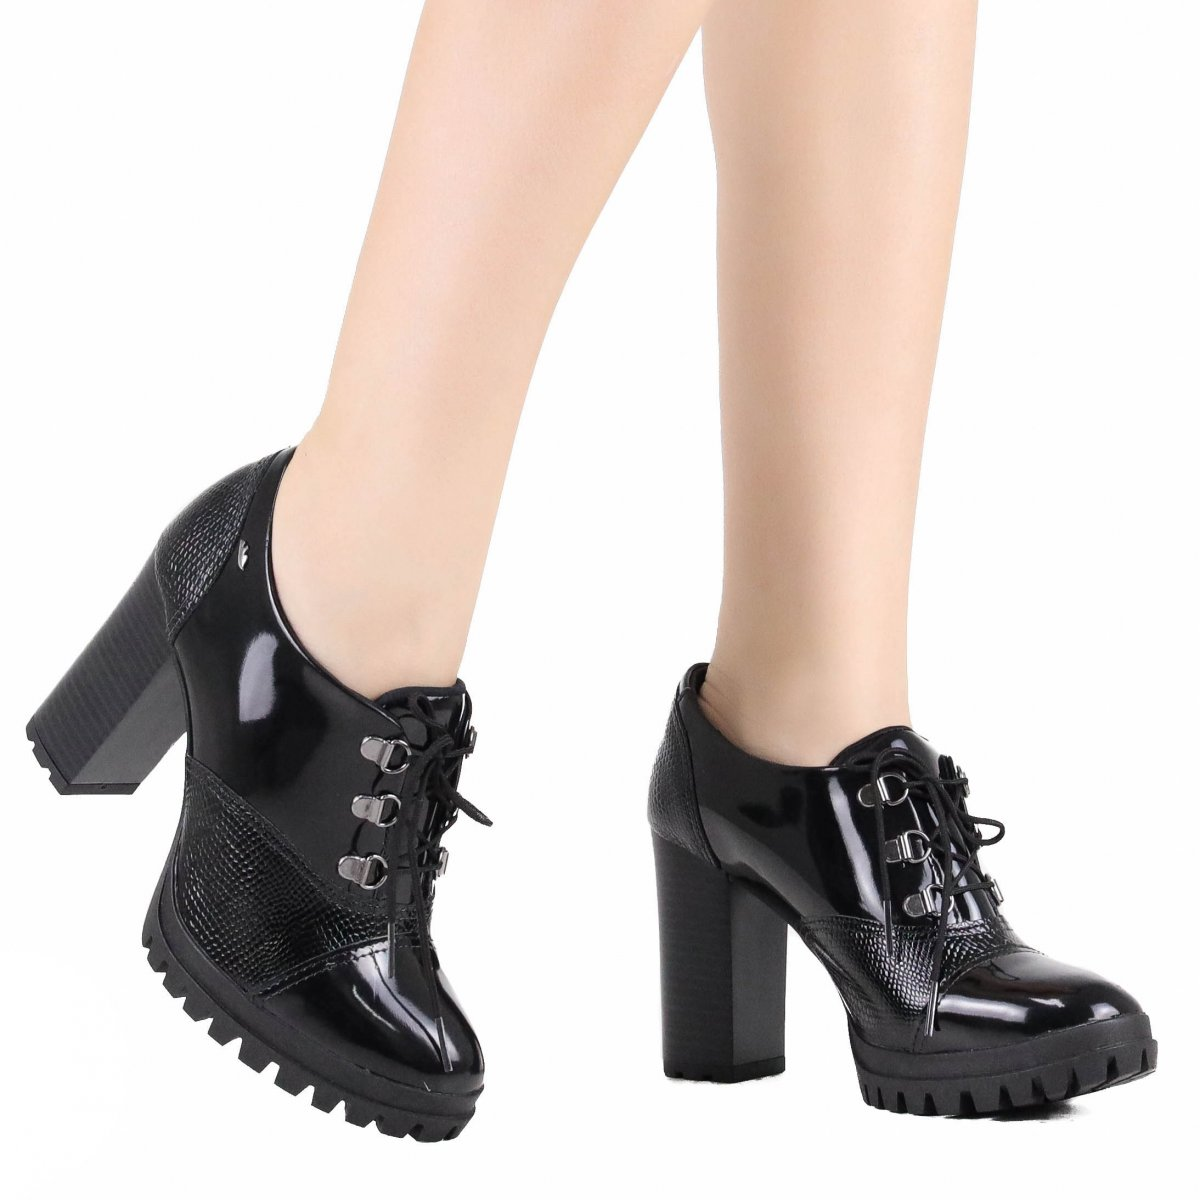 e7fab674b4 Sapato Dakota Oxford Salto Alto